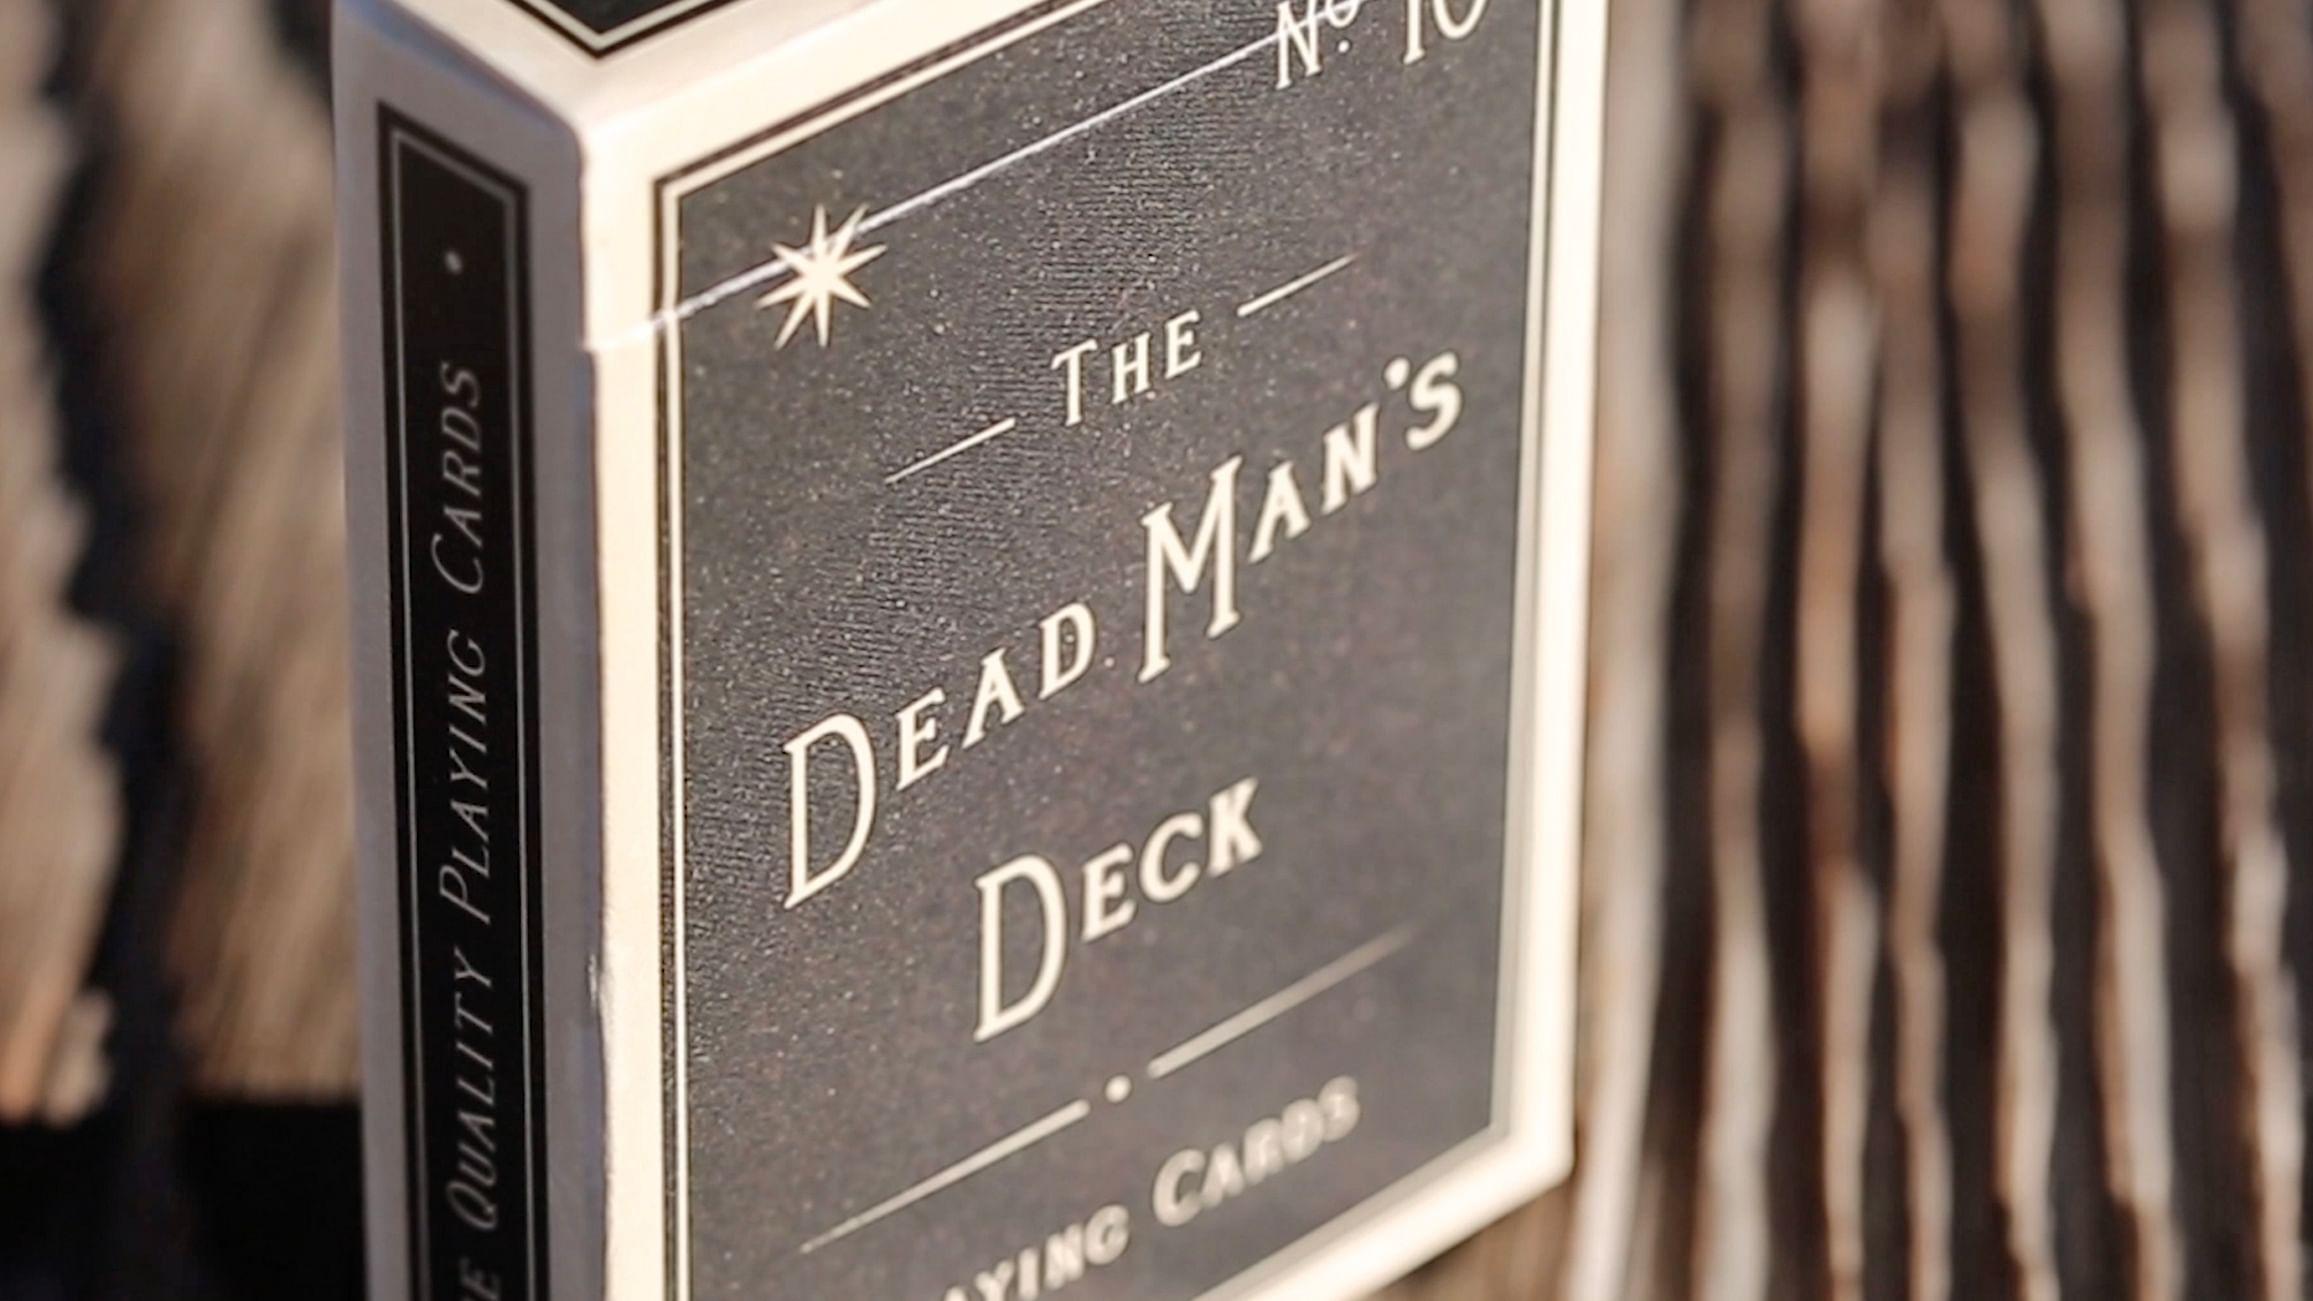 Dead Man's Deck - magic